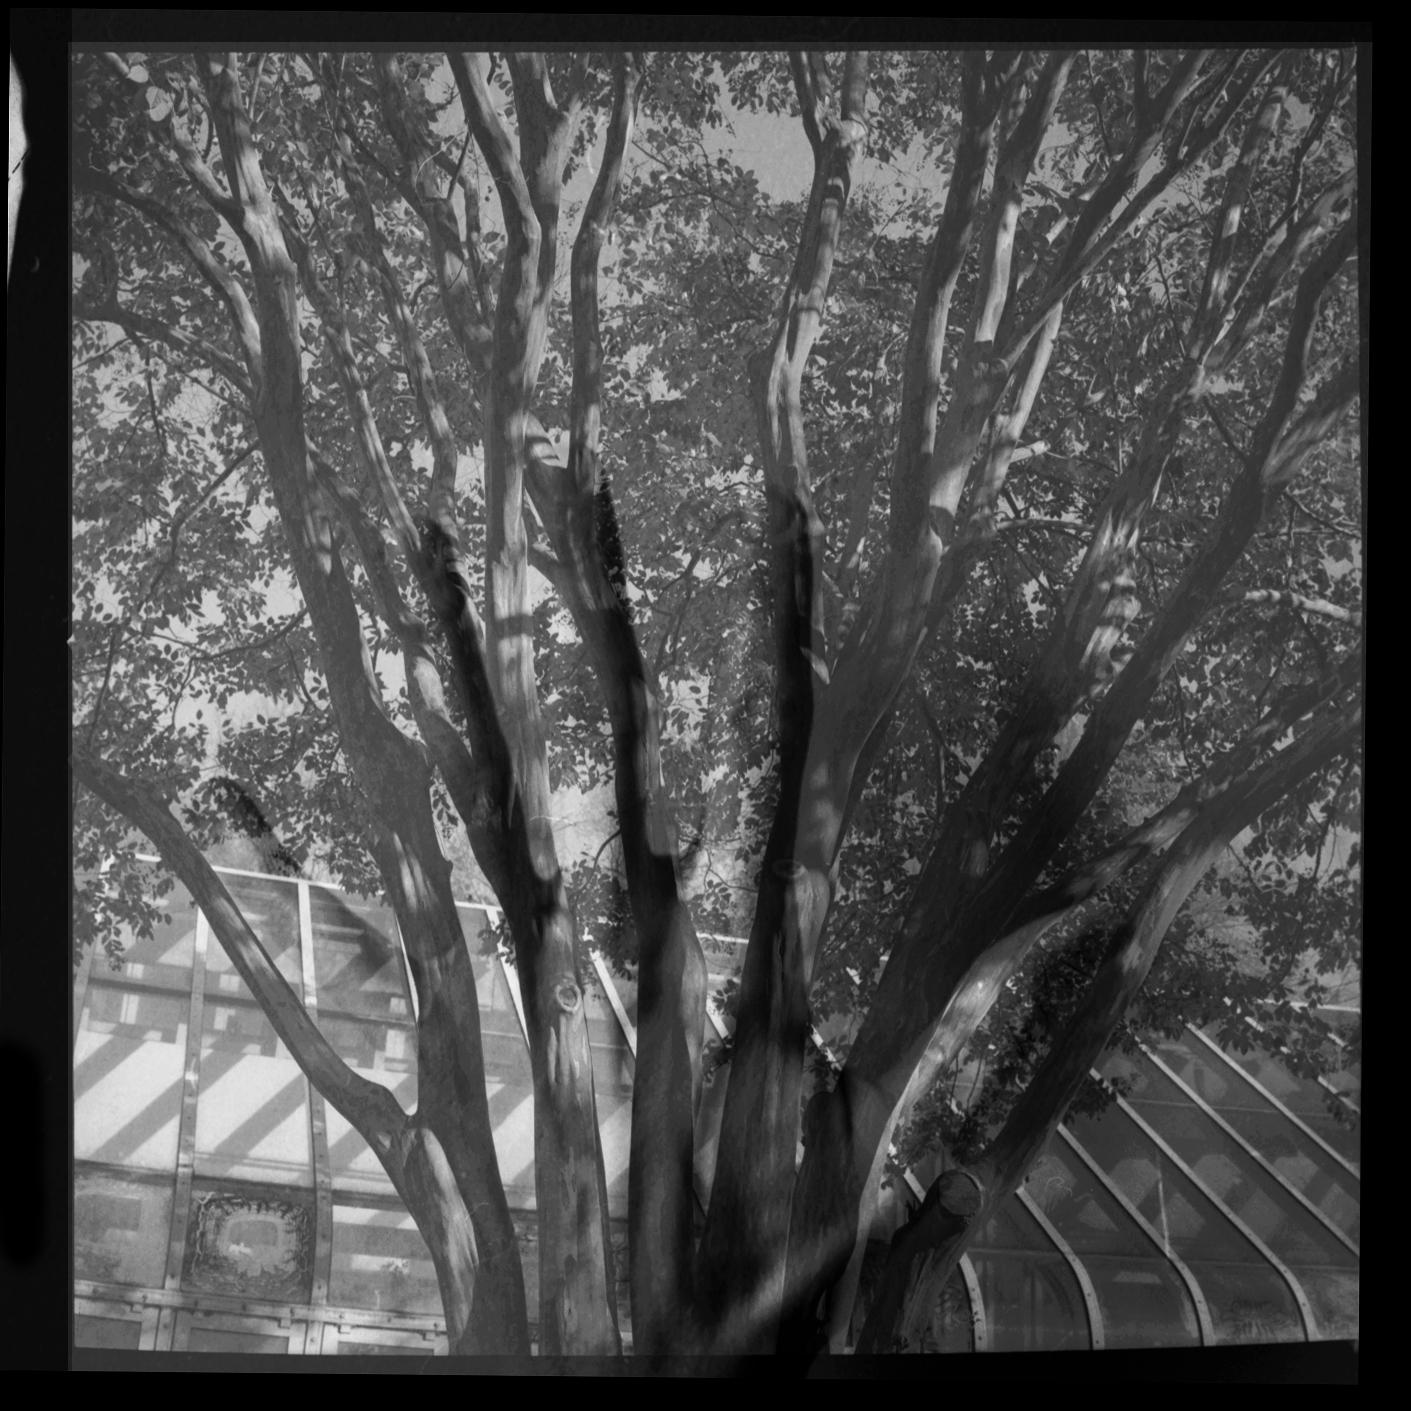 treehand_edited-1.jpg